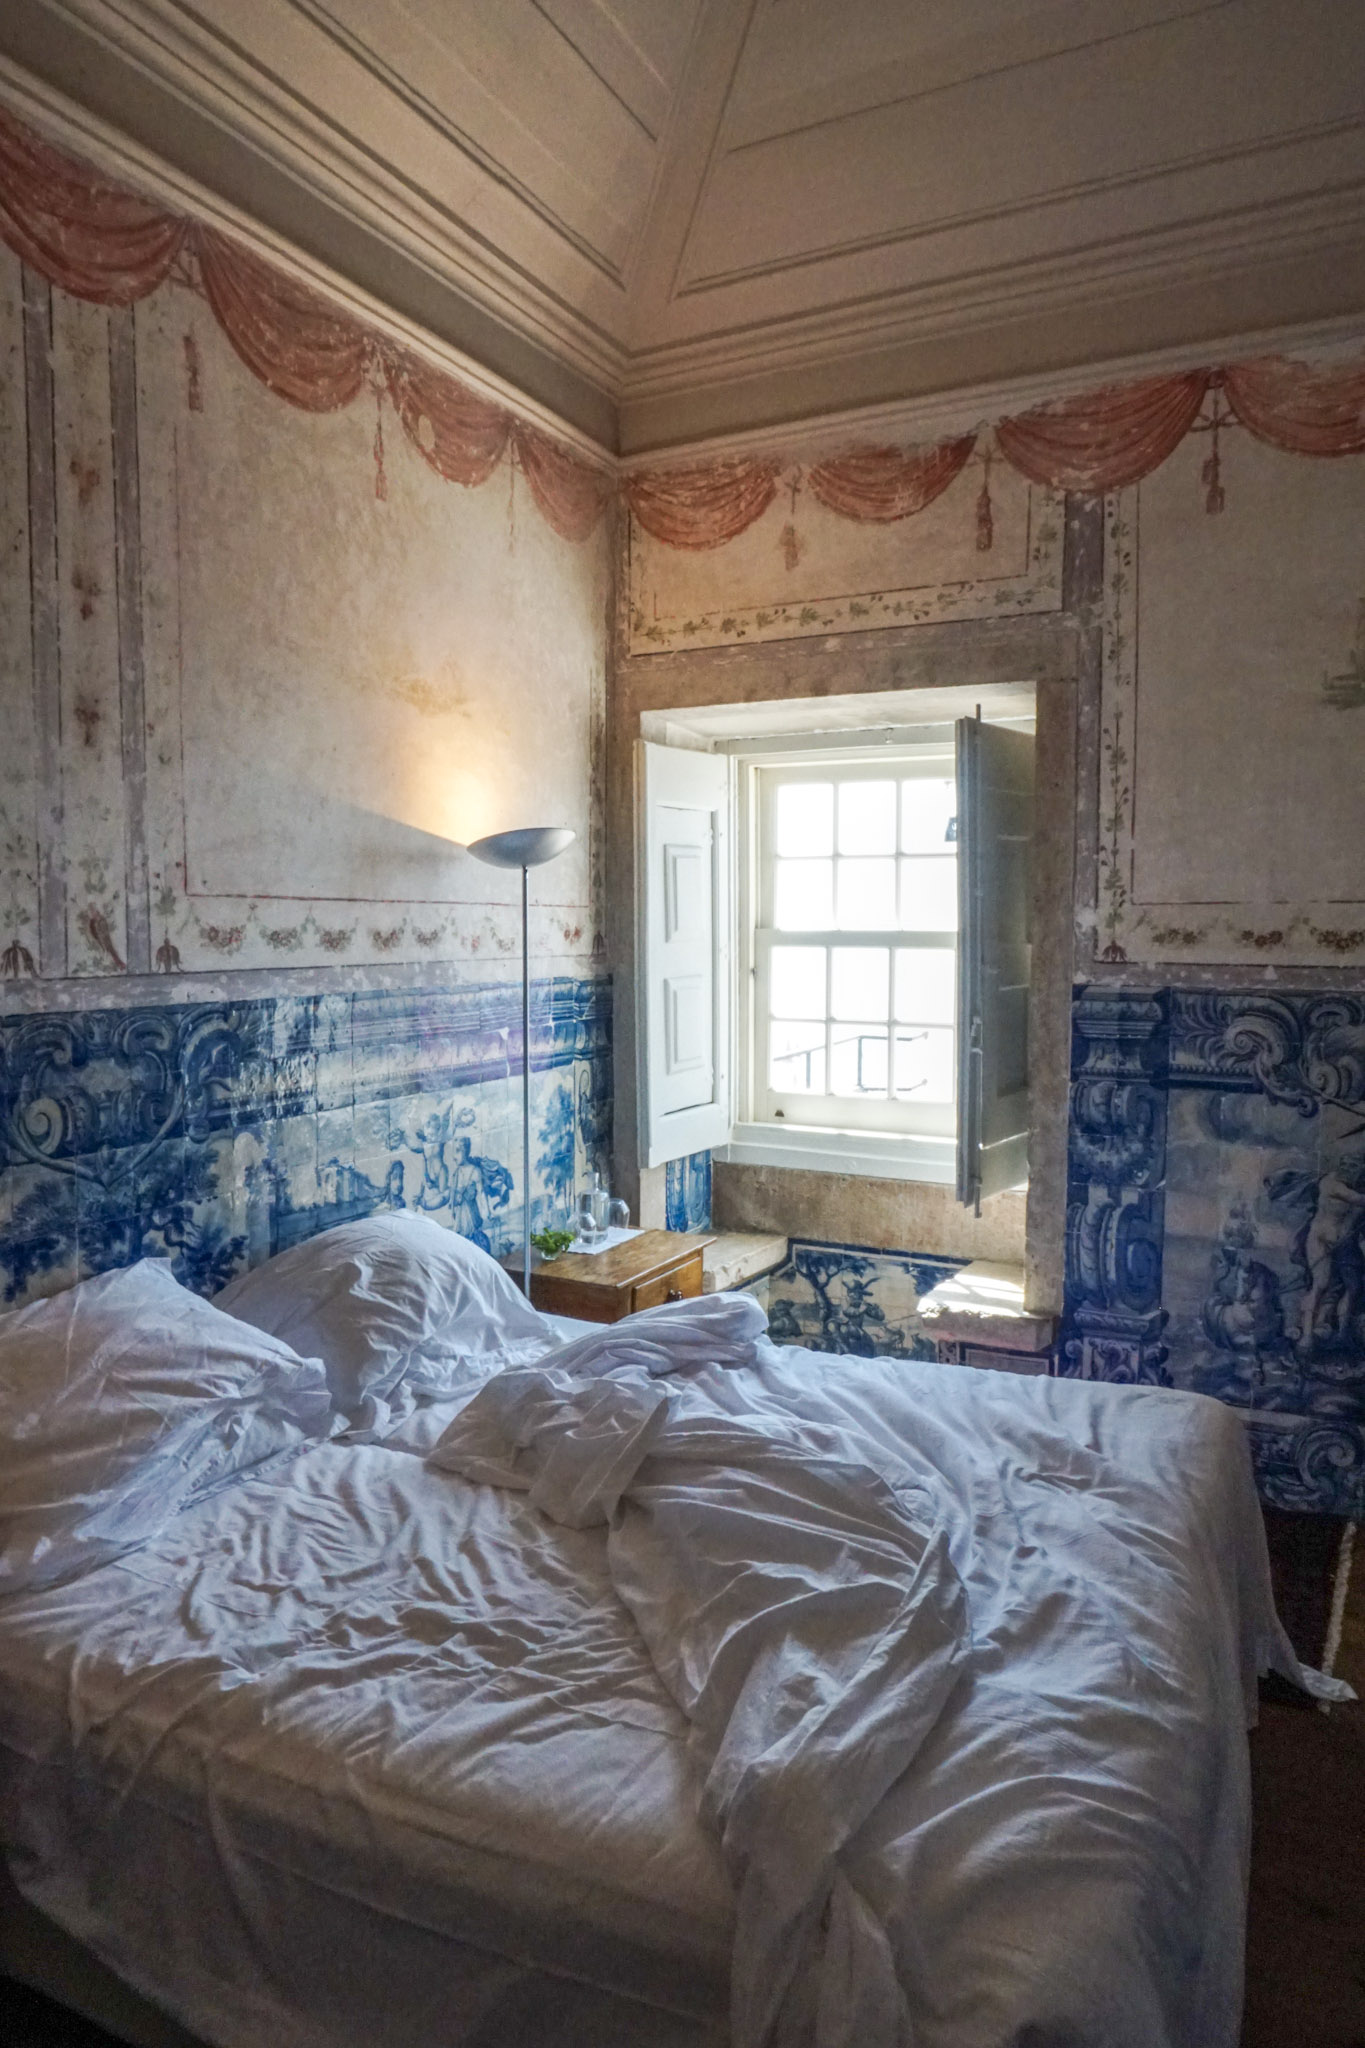 curio.trips.portugal.lisbon.palacio.belmonte.room.jpg